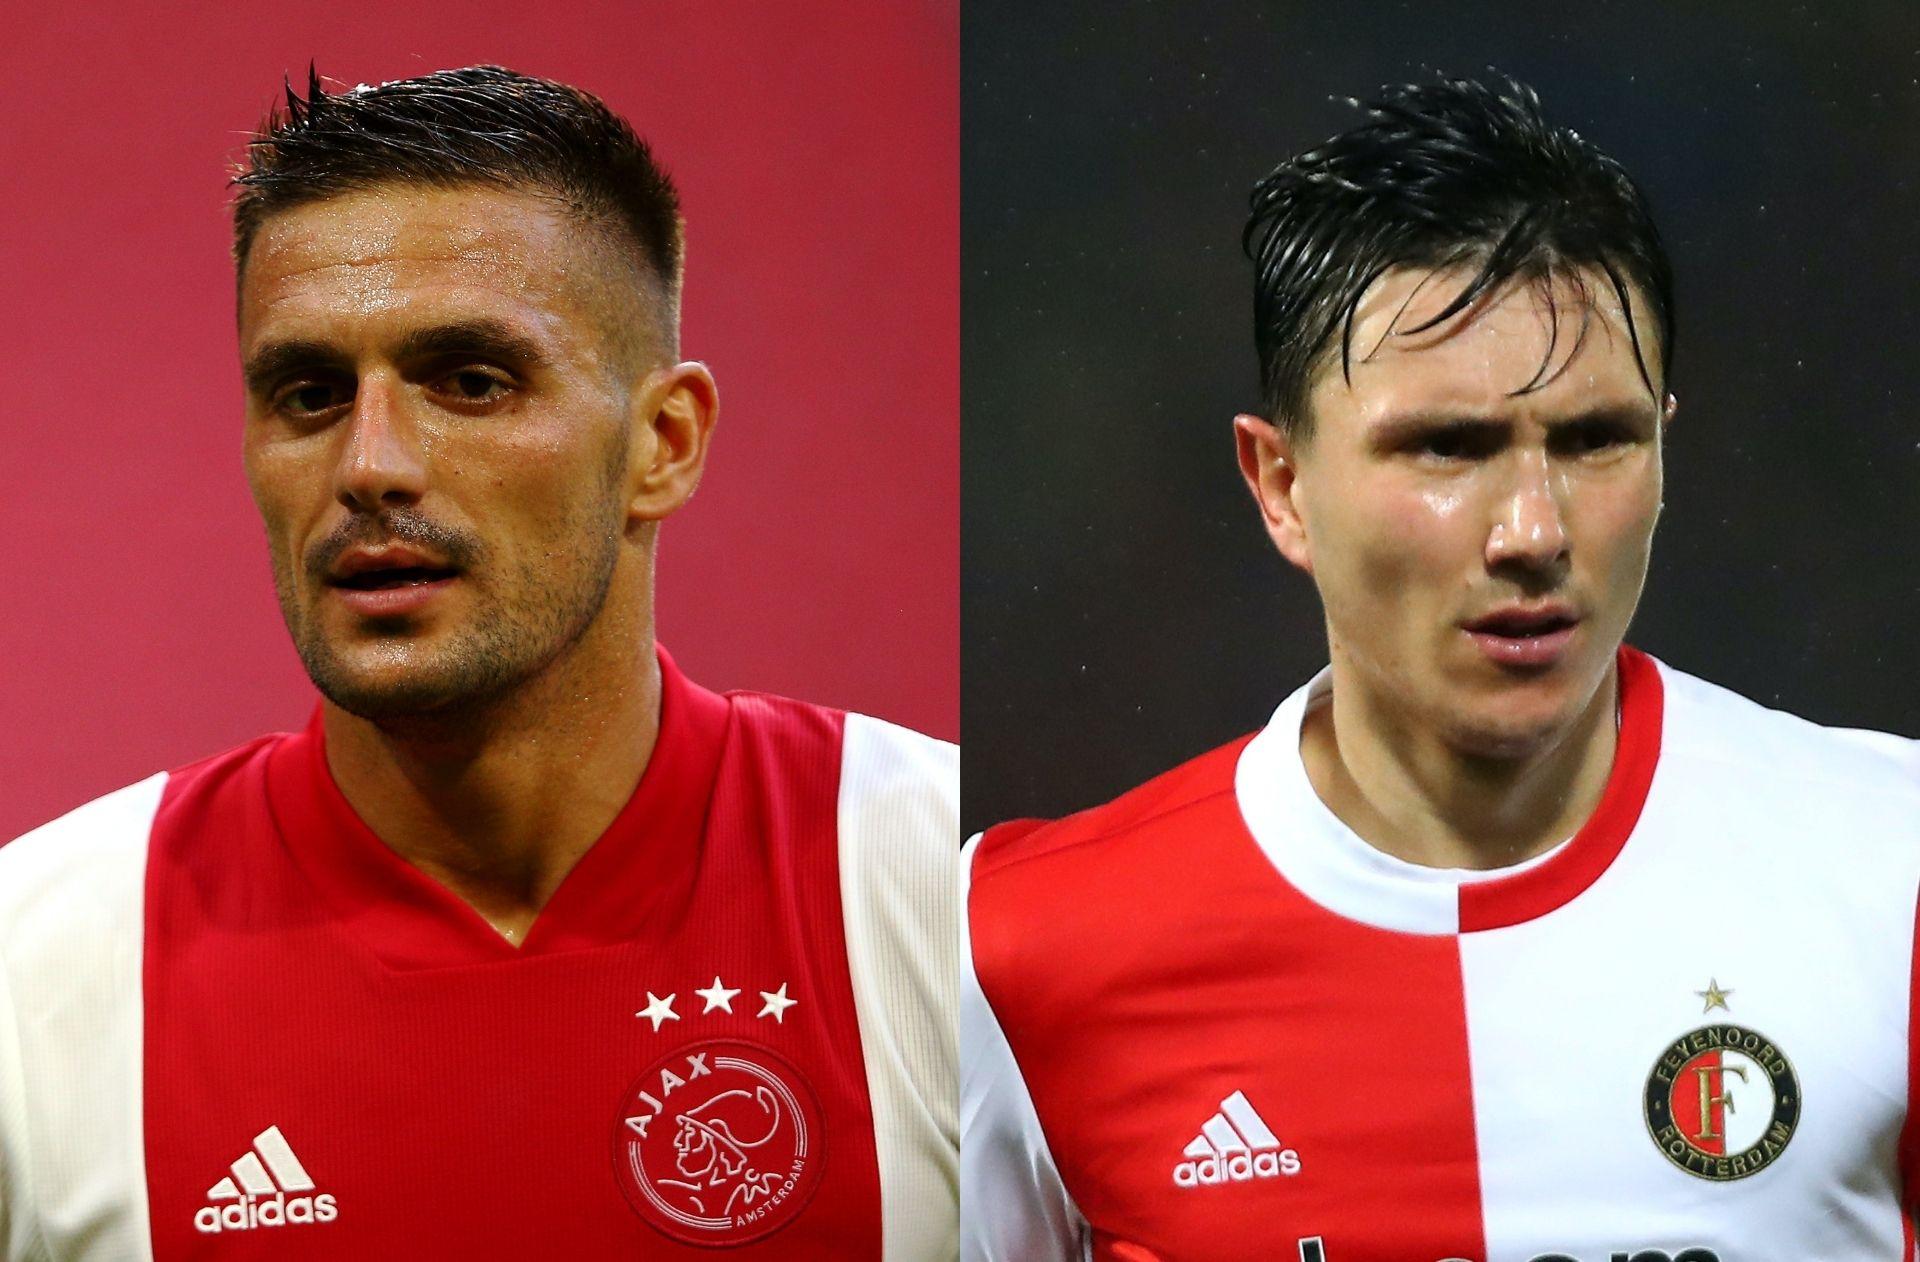 Feyenoord vs ajax betting tips sports betting company london